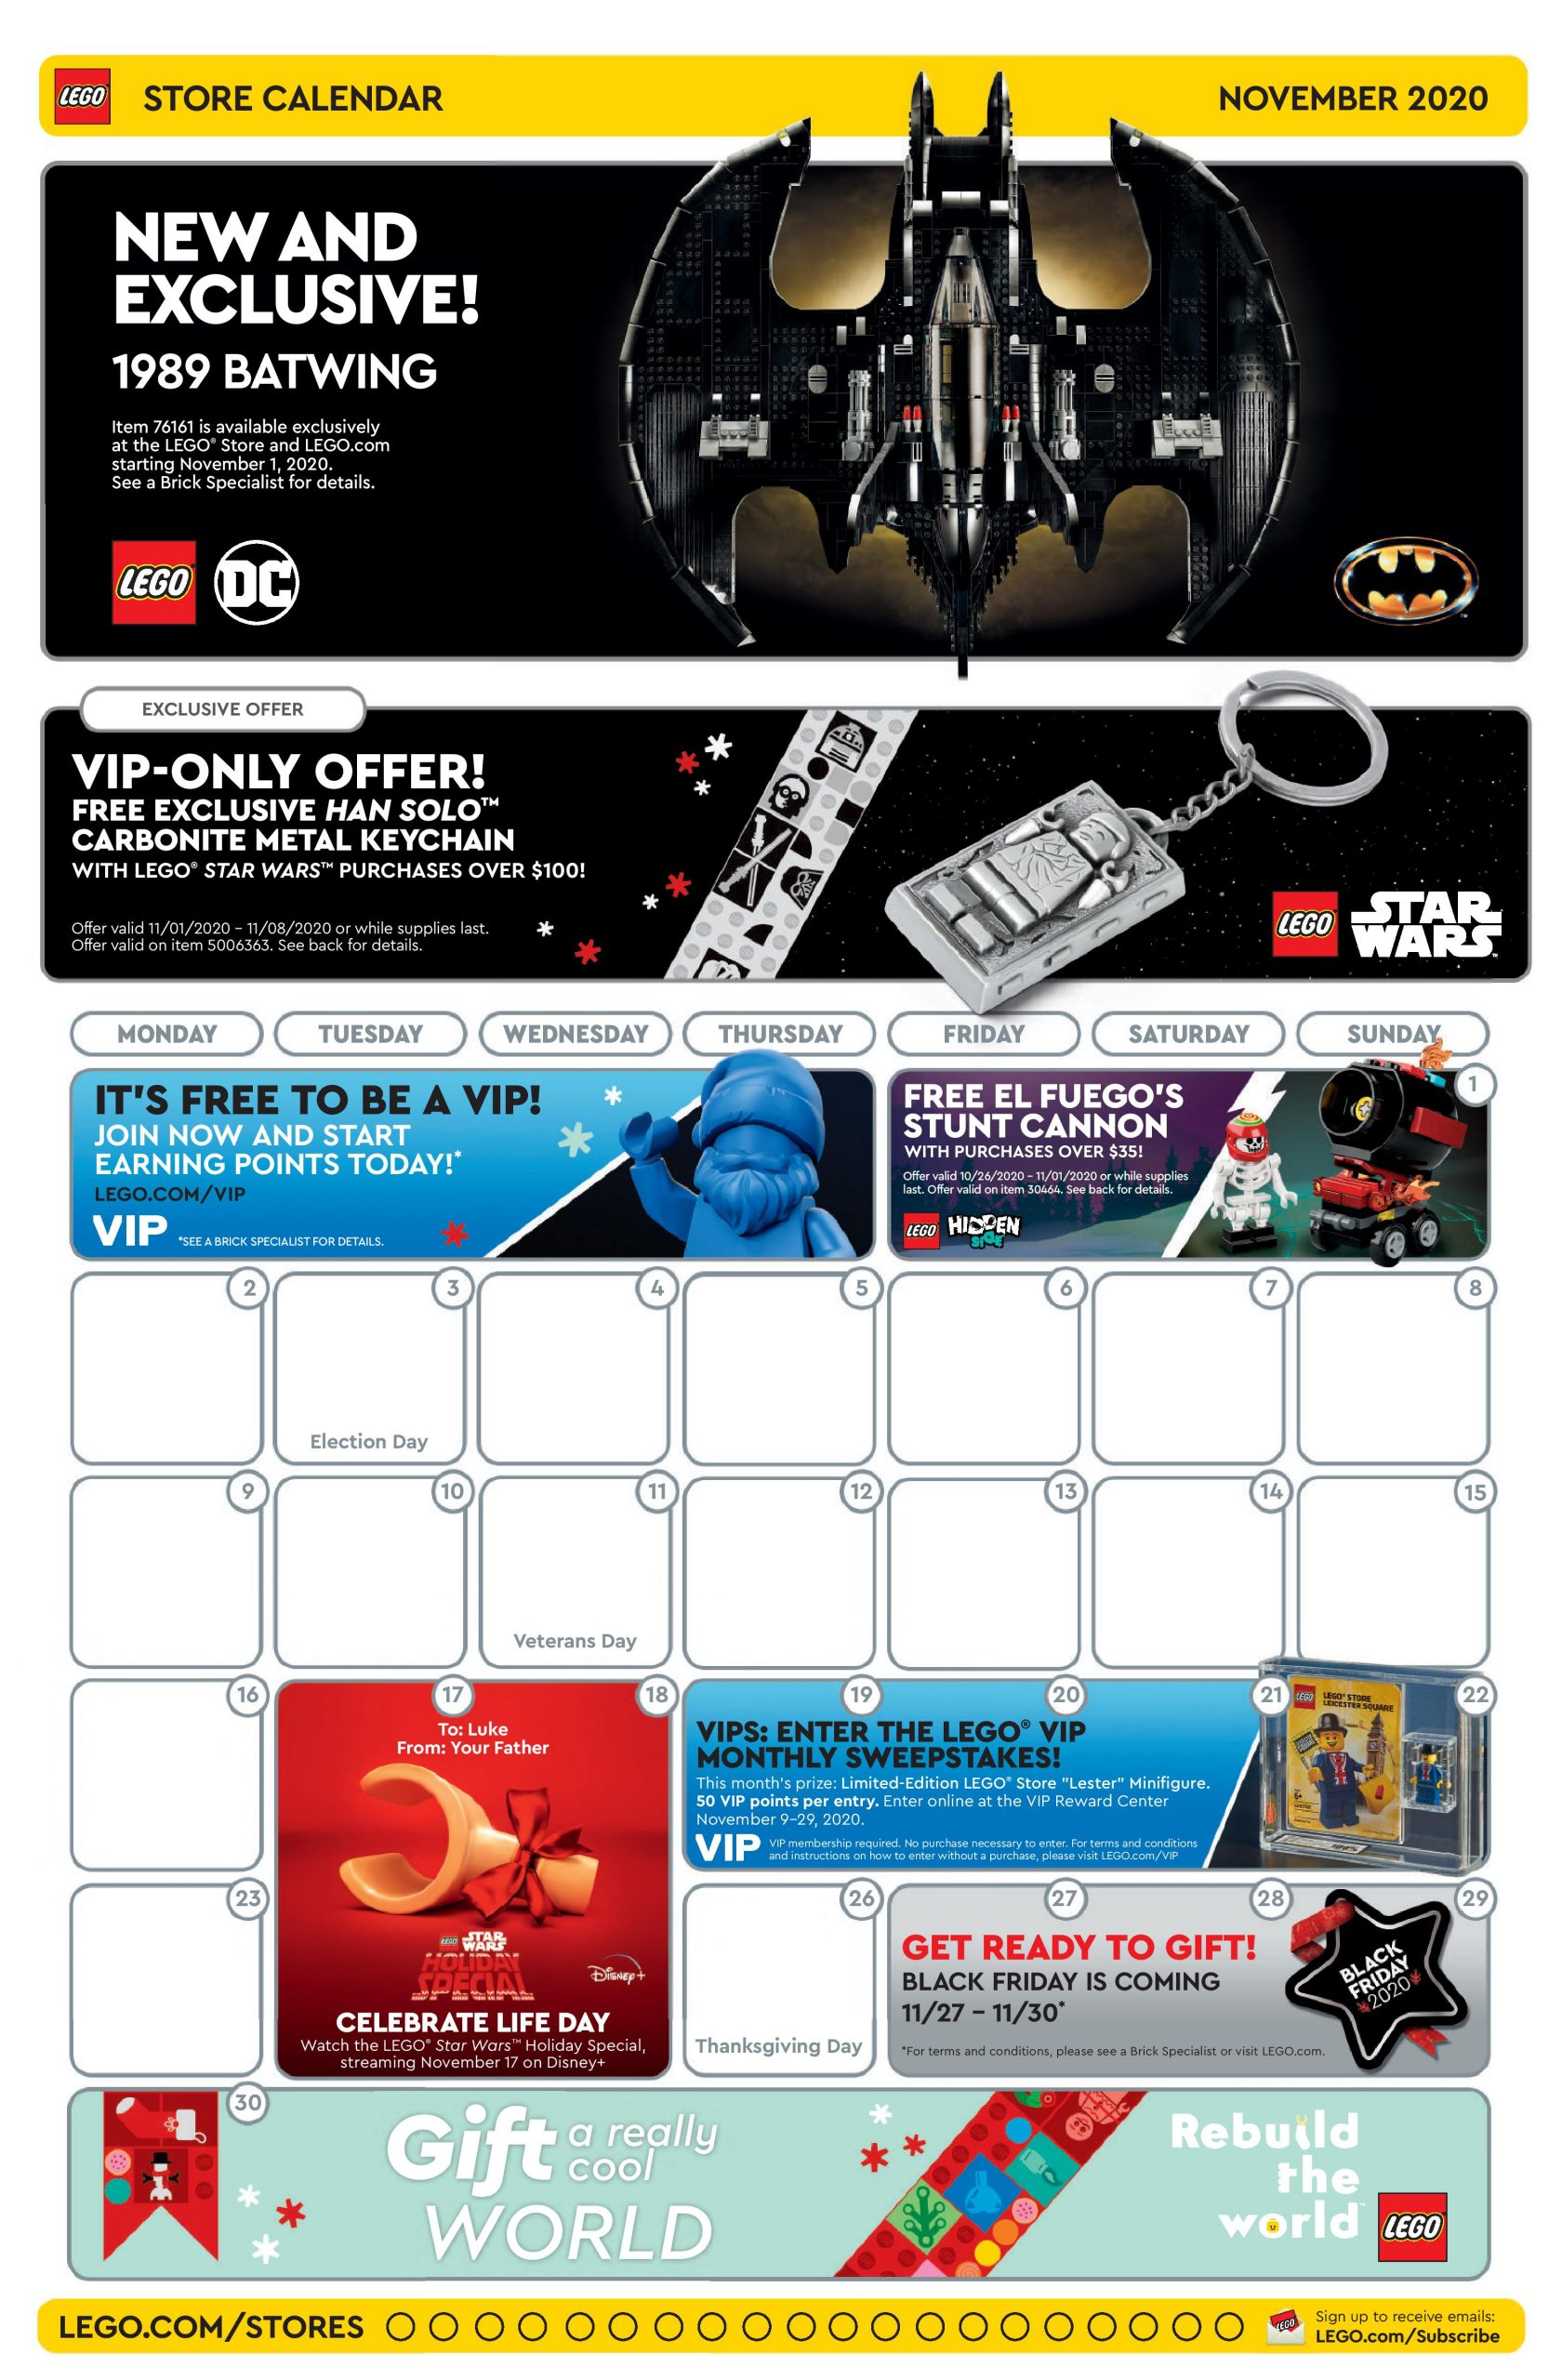 Lego November 2022 Calendar.Lego November 2020 Store Calendar Promotions Events The Brick Fan